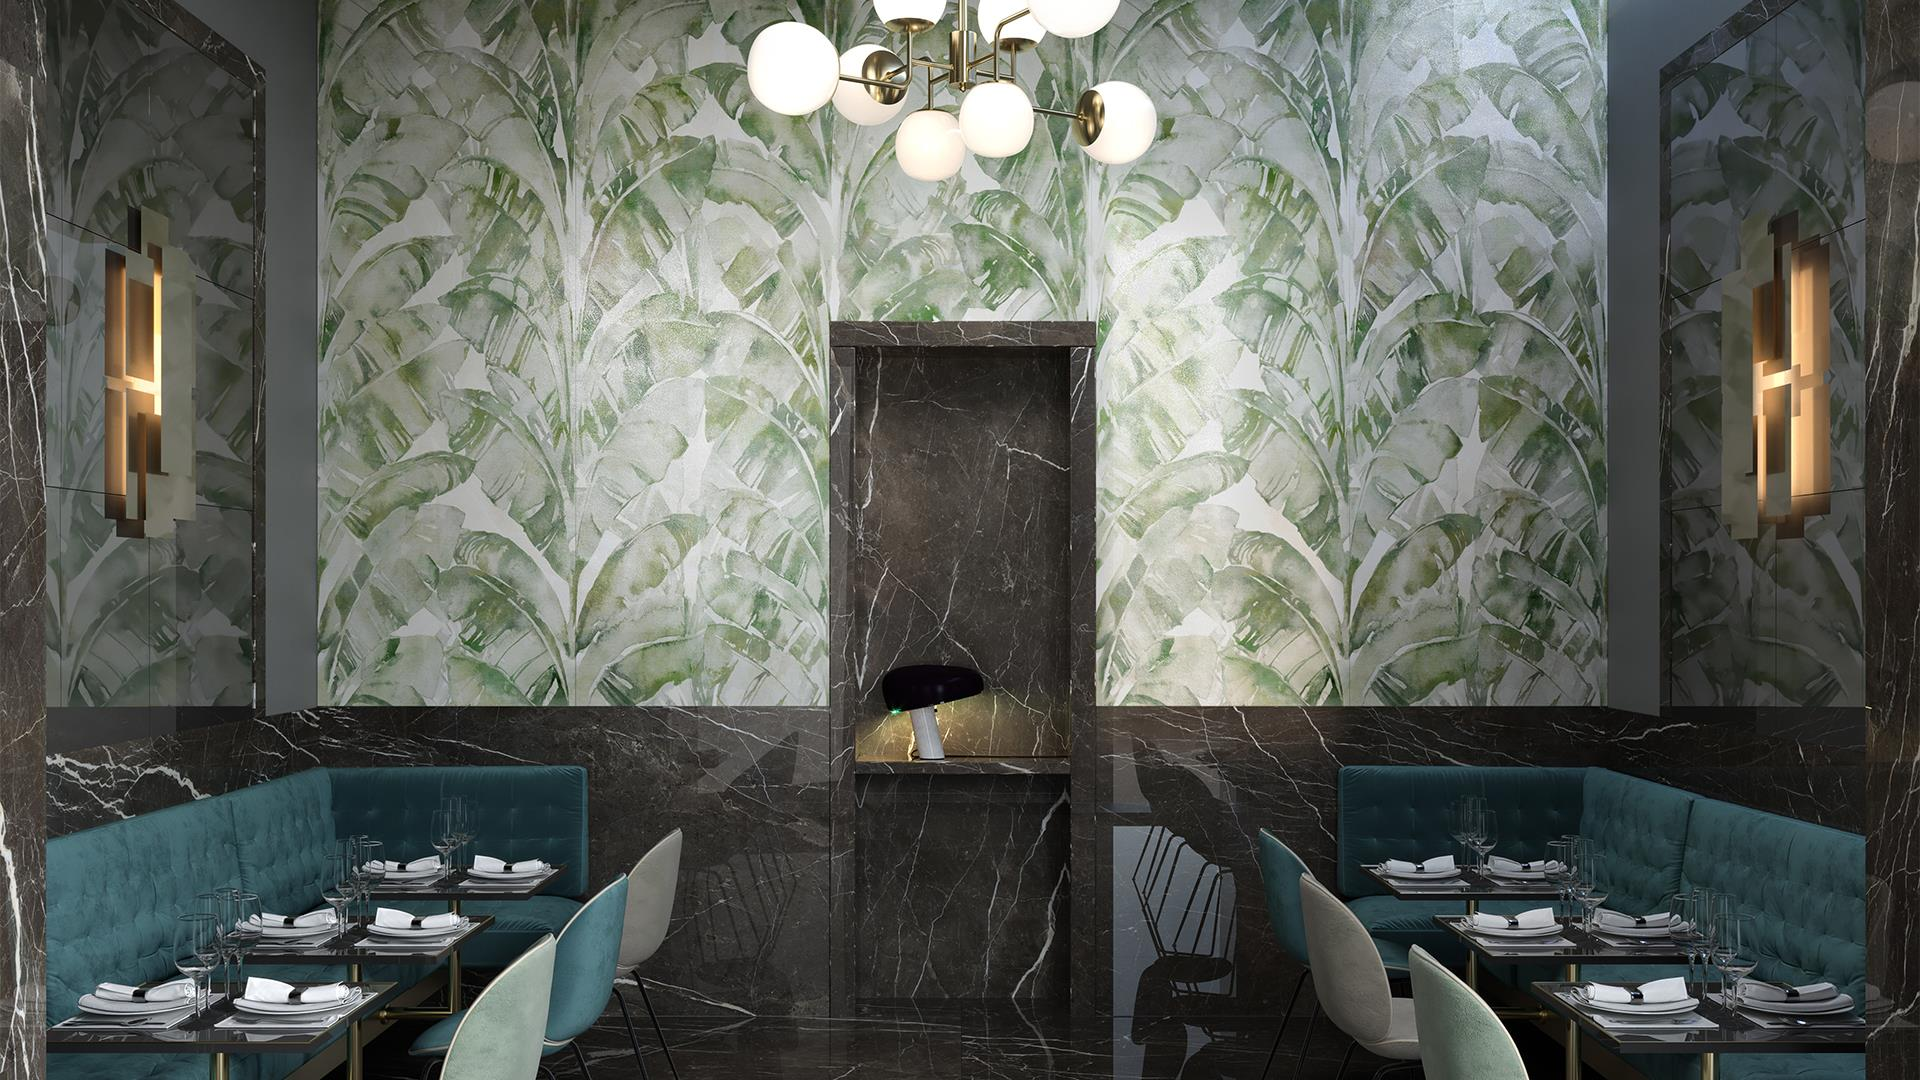 Cotto D Este Innovatively Reinterprets Wallpaper With